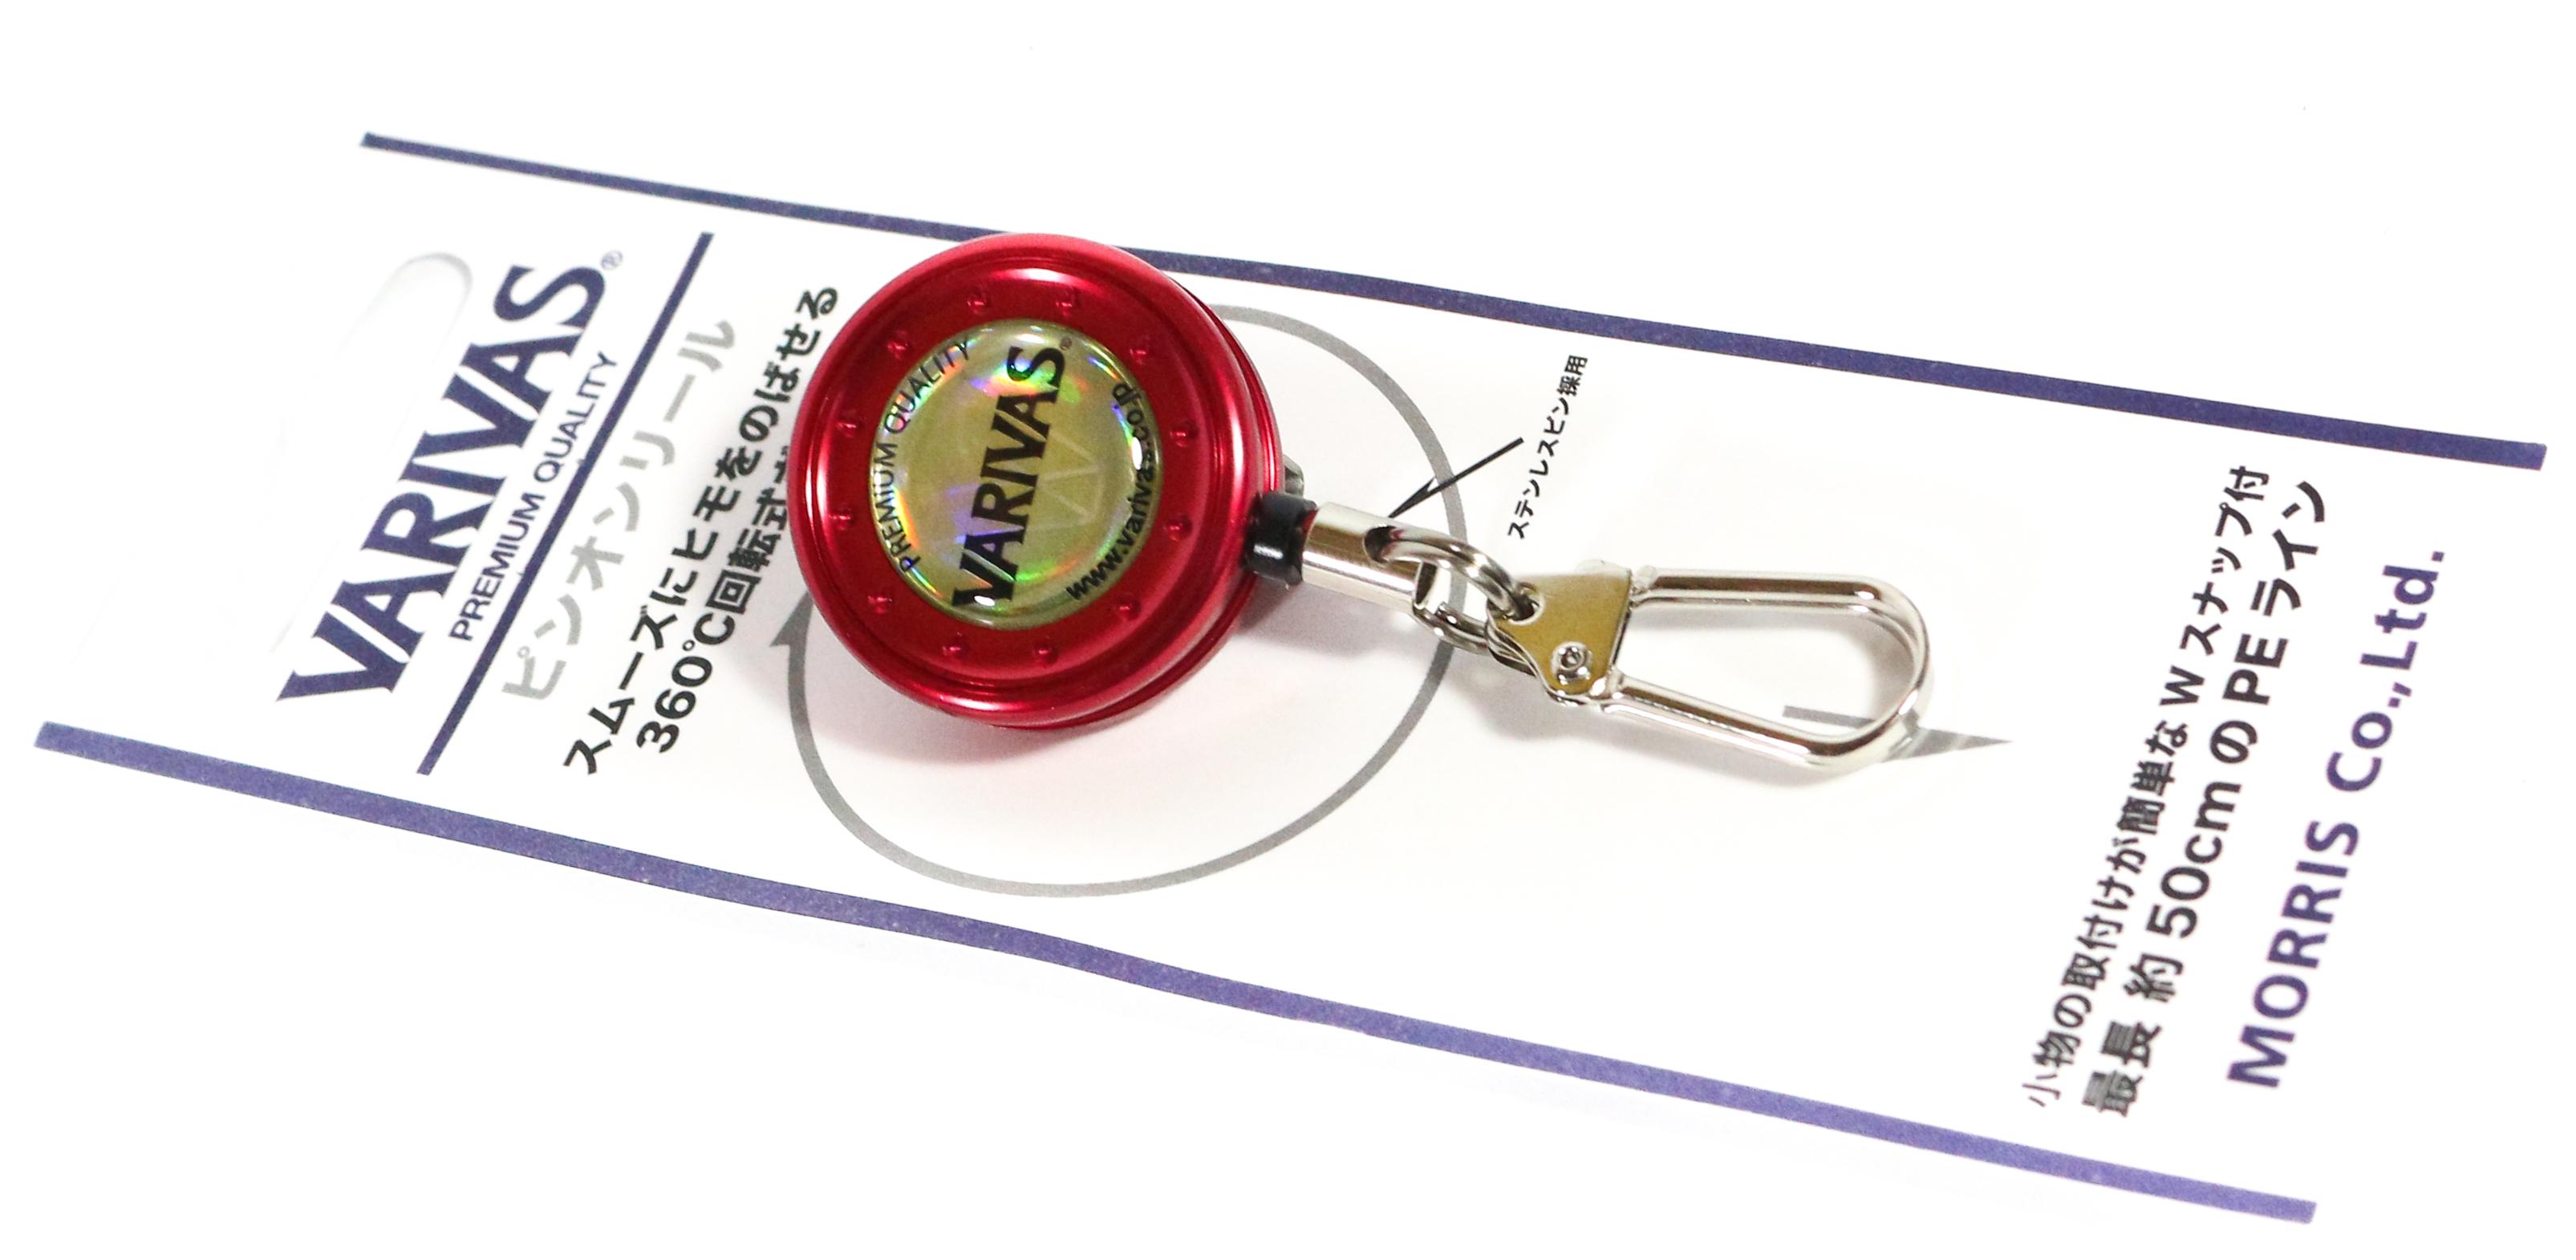 Sale Varivas Pin On Reel 30 x 11 mm Red (7257)